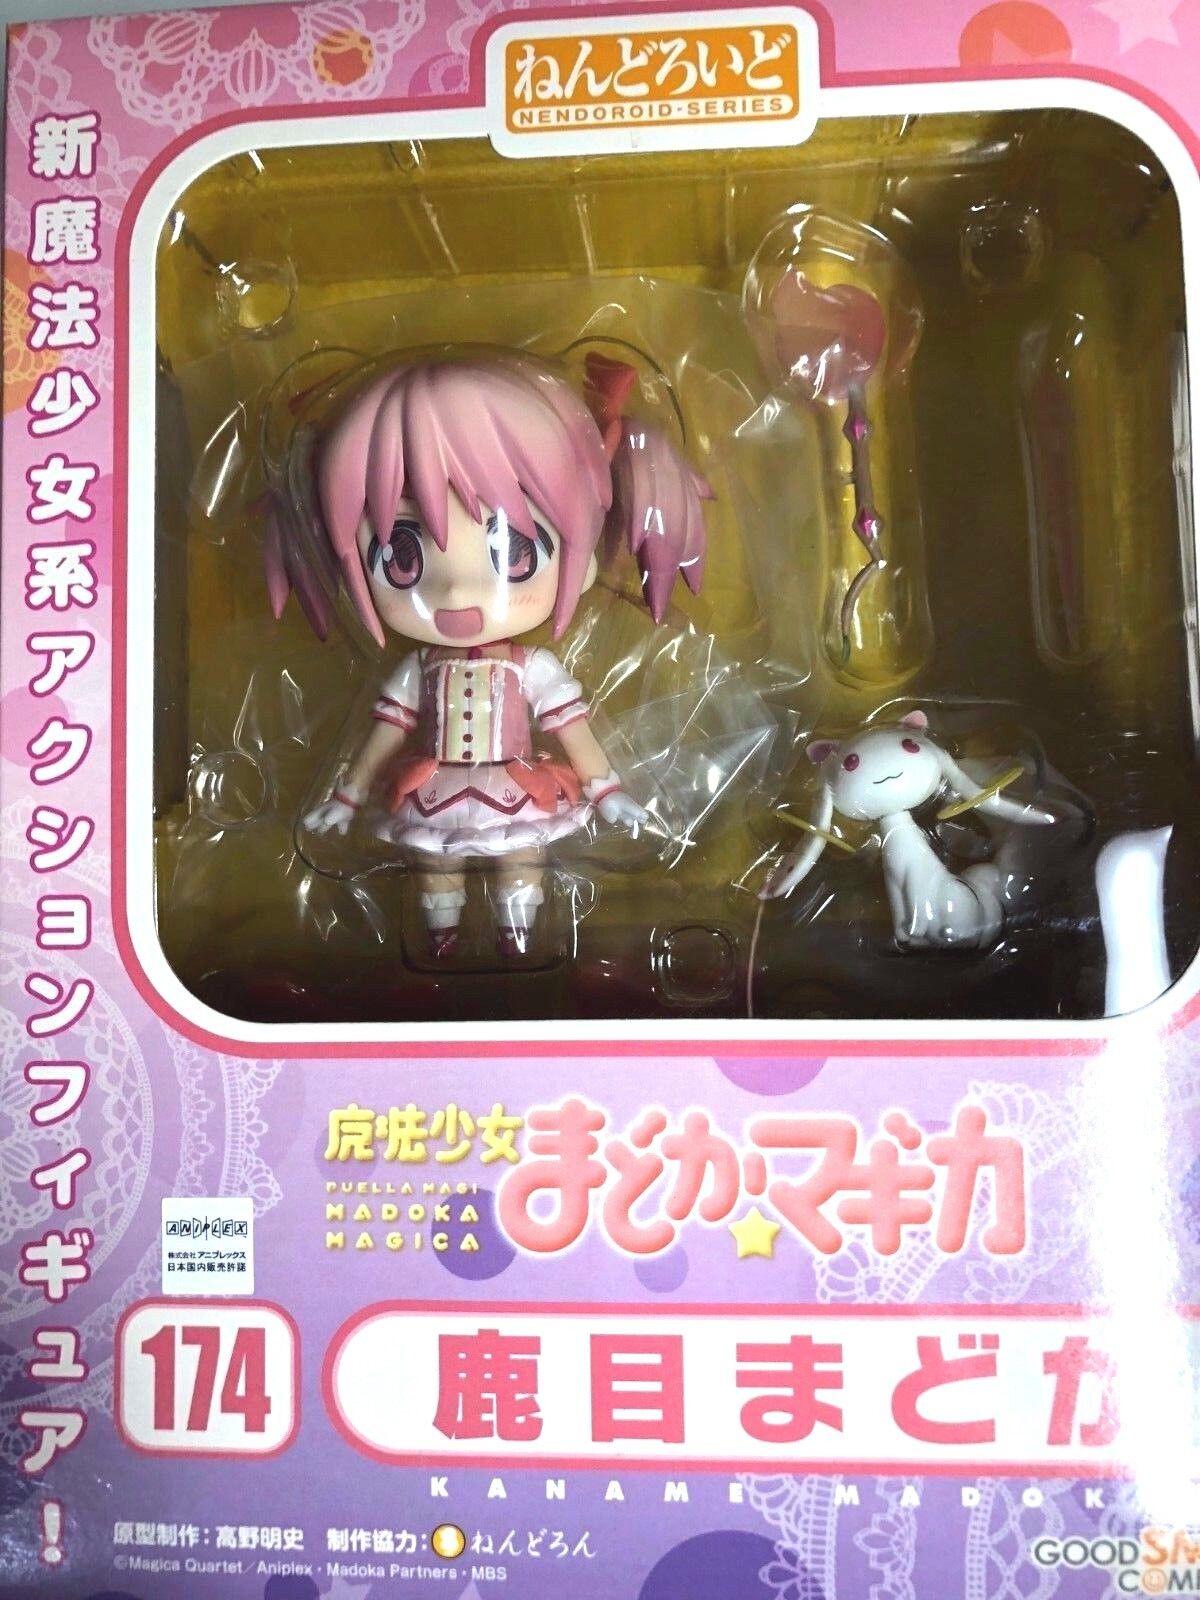 Free Shipping from Japan Authentic Nendoroid Madoka Kaname Puella Magi Madoka